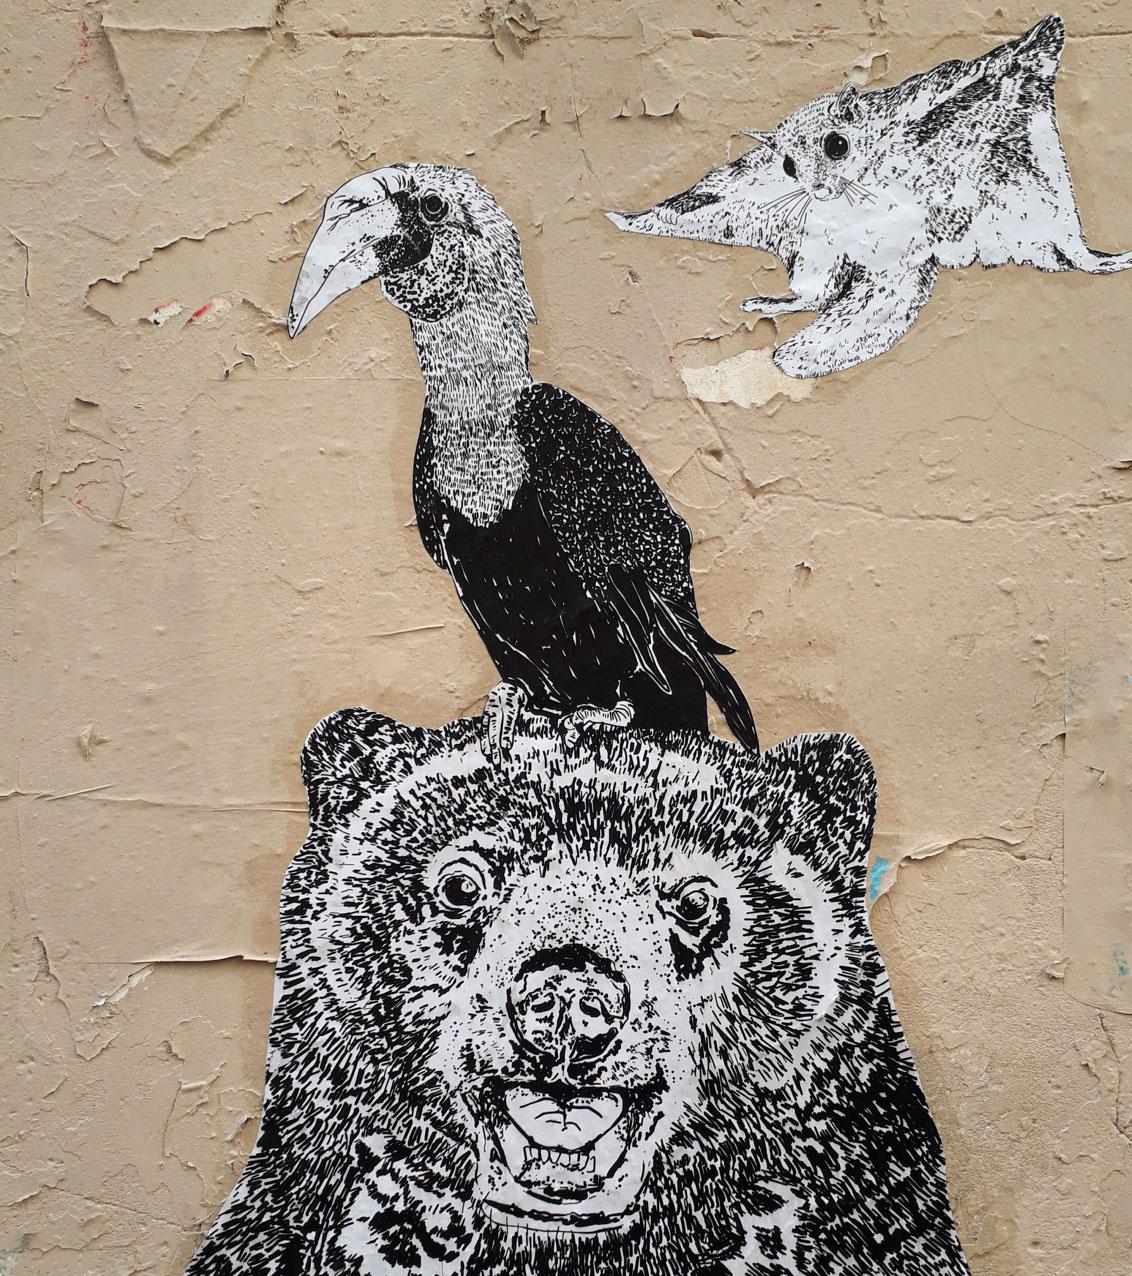 Street art in Paris endangered activism